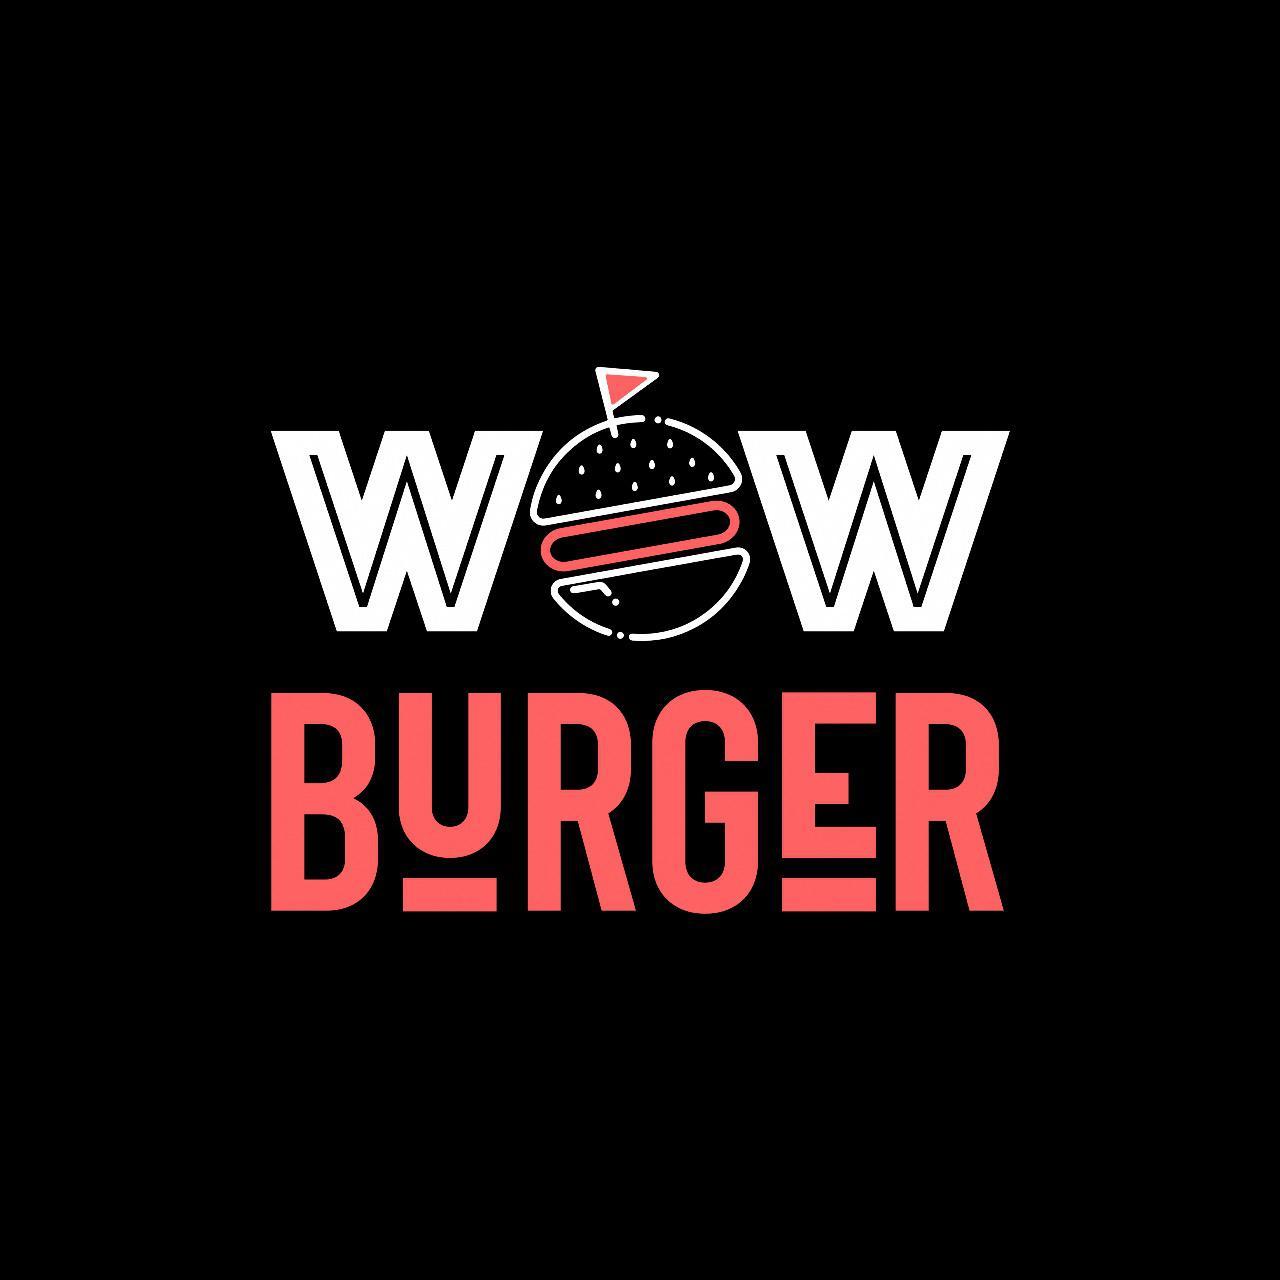 WOW BURGER לוגו